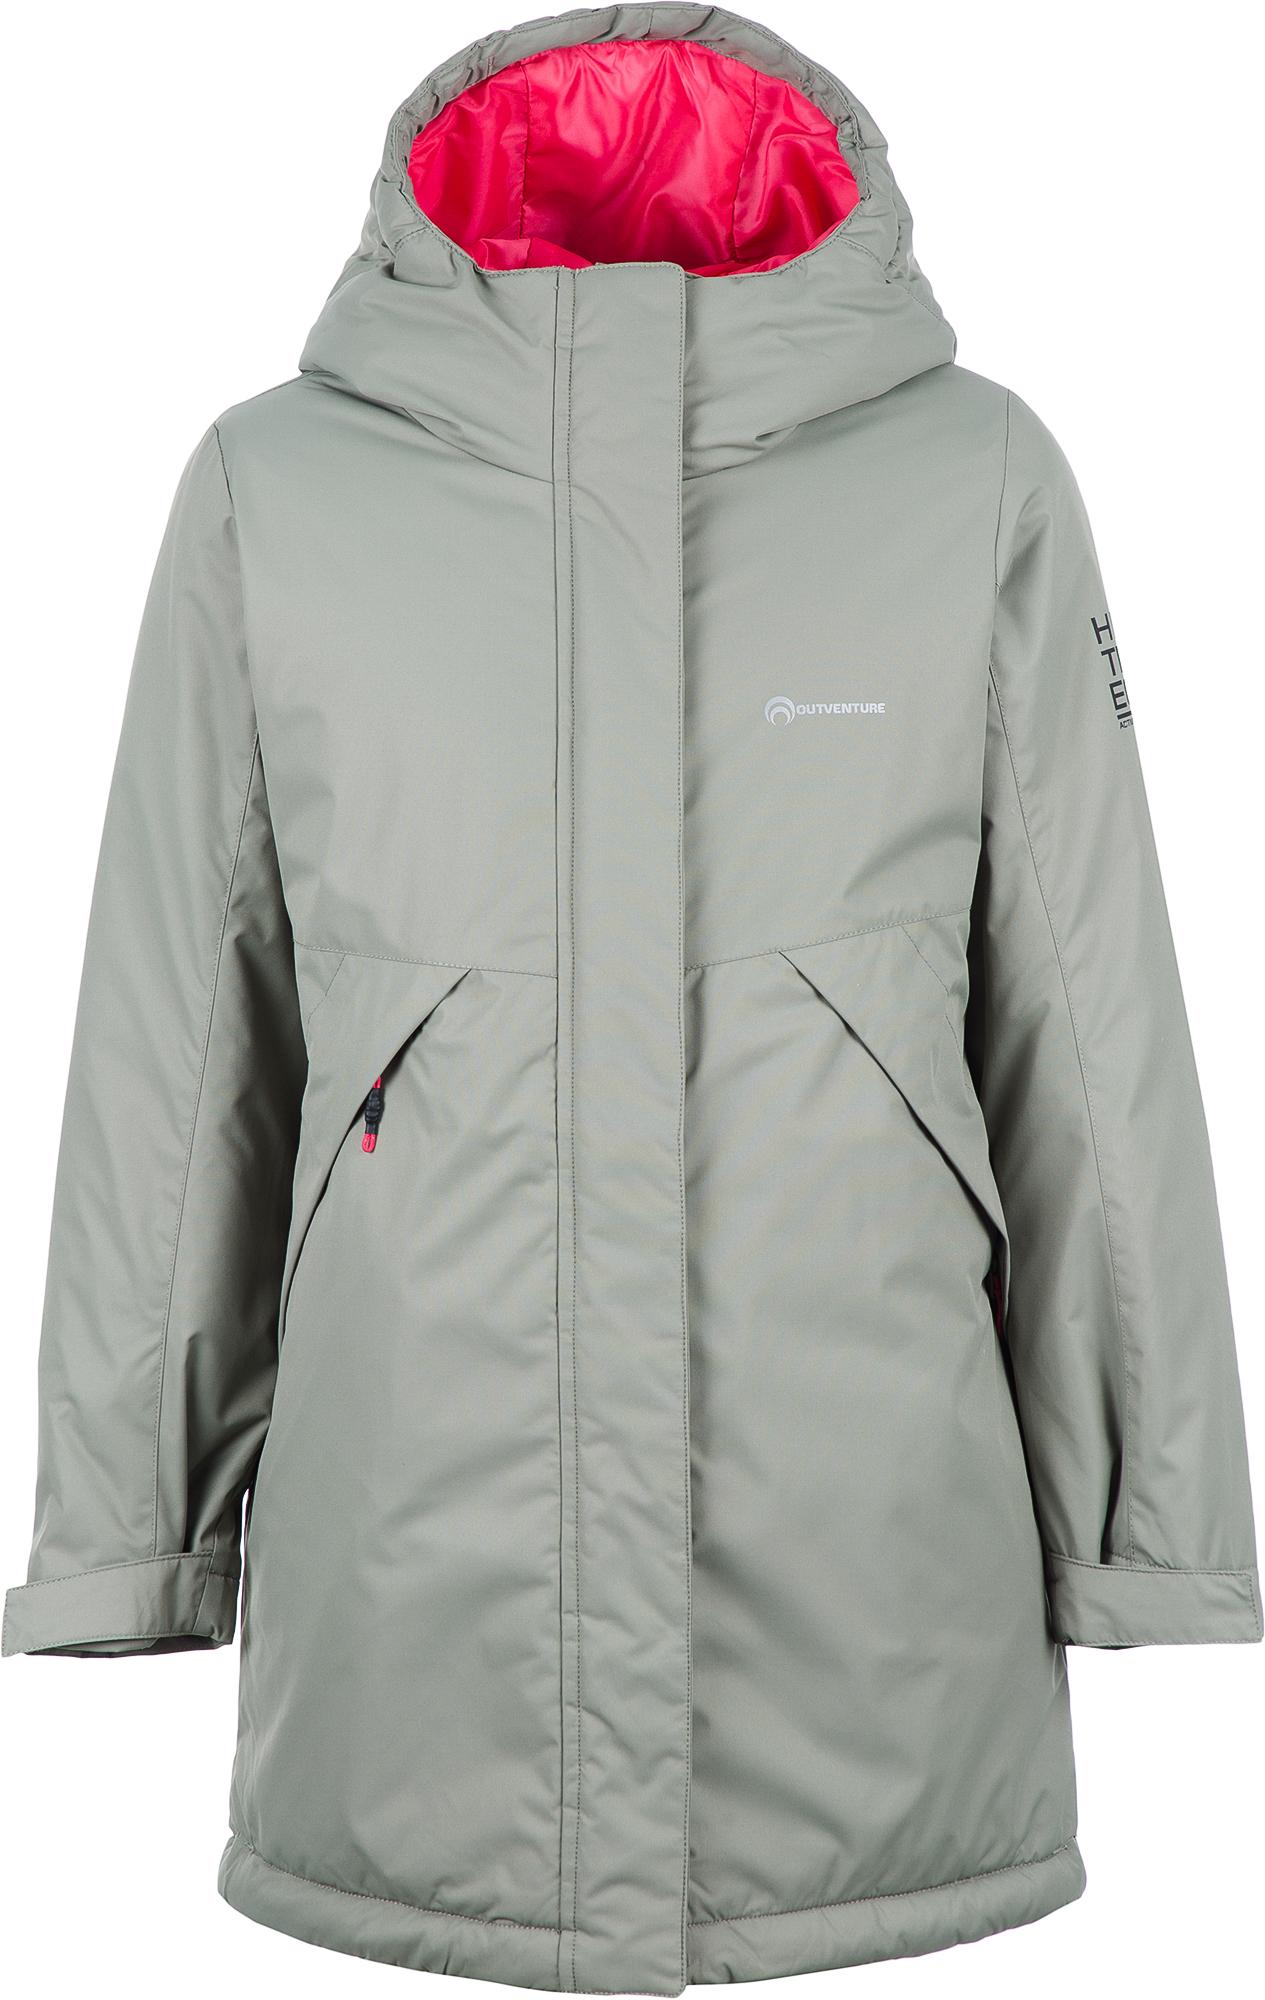 Outventure Куртка утепленная для девочек Outventure, размер 152